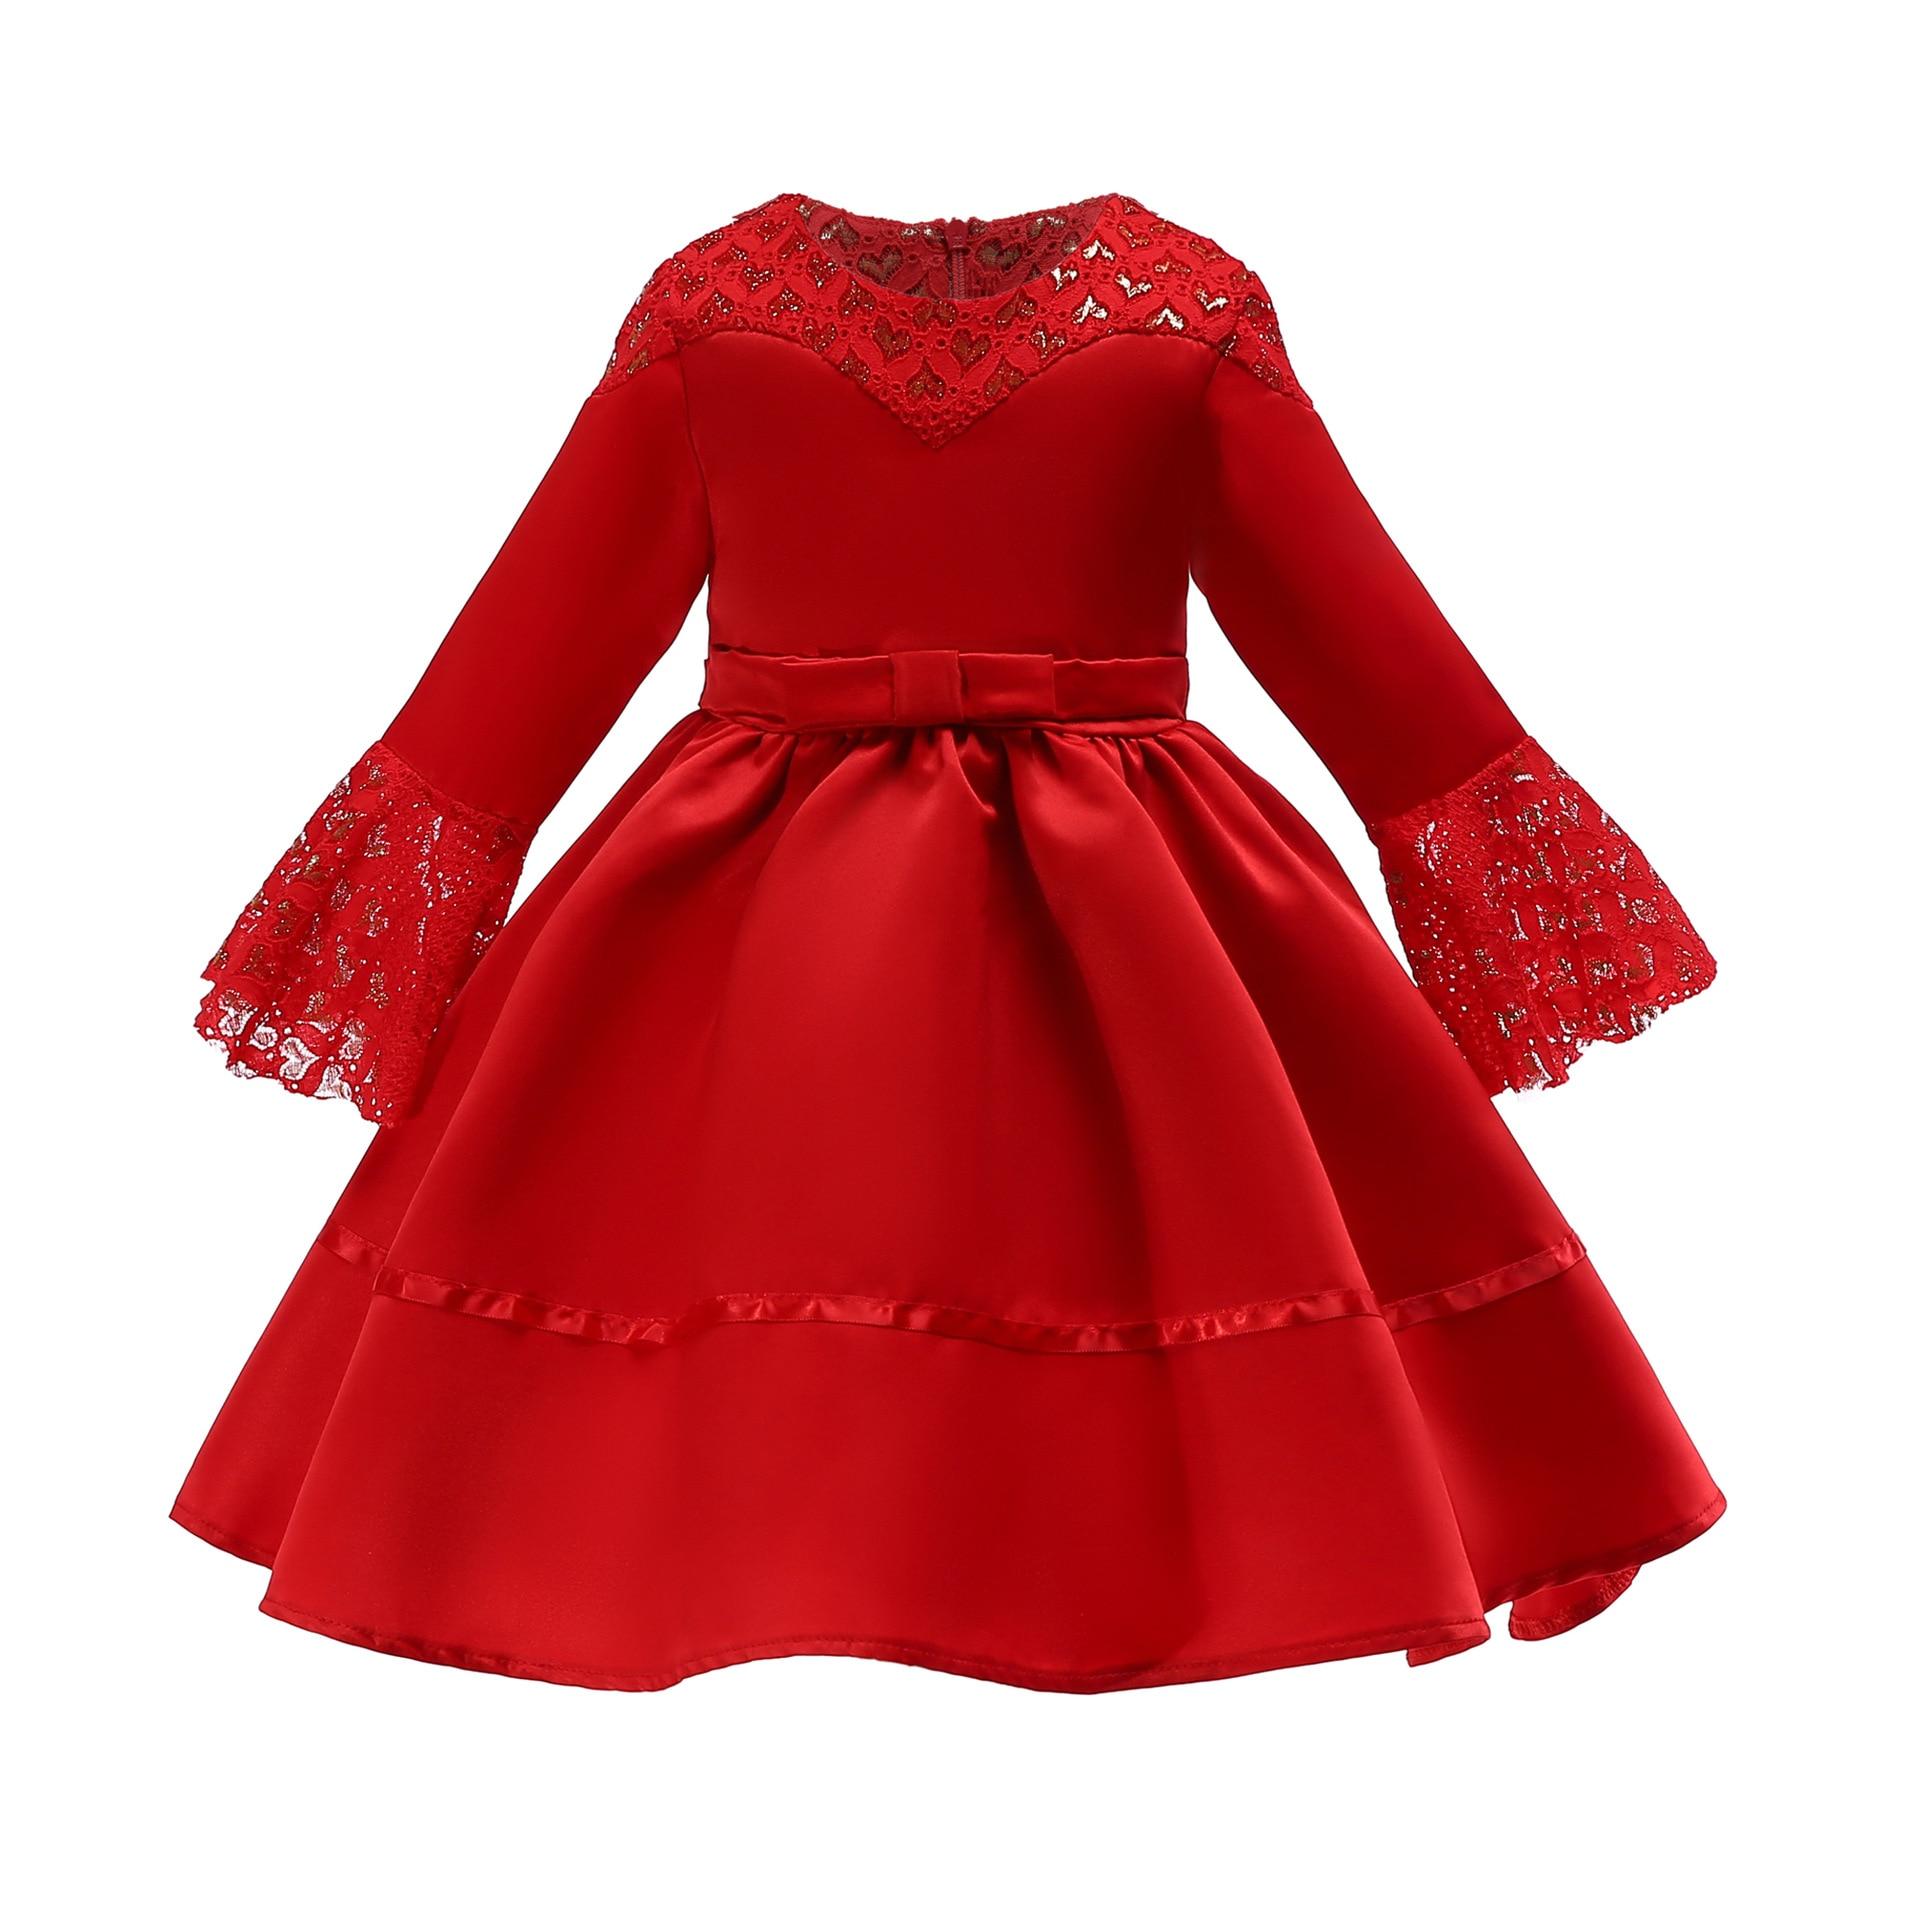 Muslim Girls' Skirts New 2019 Children's Dresses Medium Sleeves Lace  Dress Kids Princess Dress Girls Skirt Muslim Kids Dress